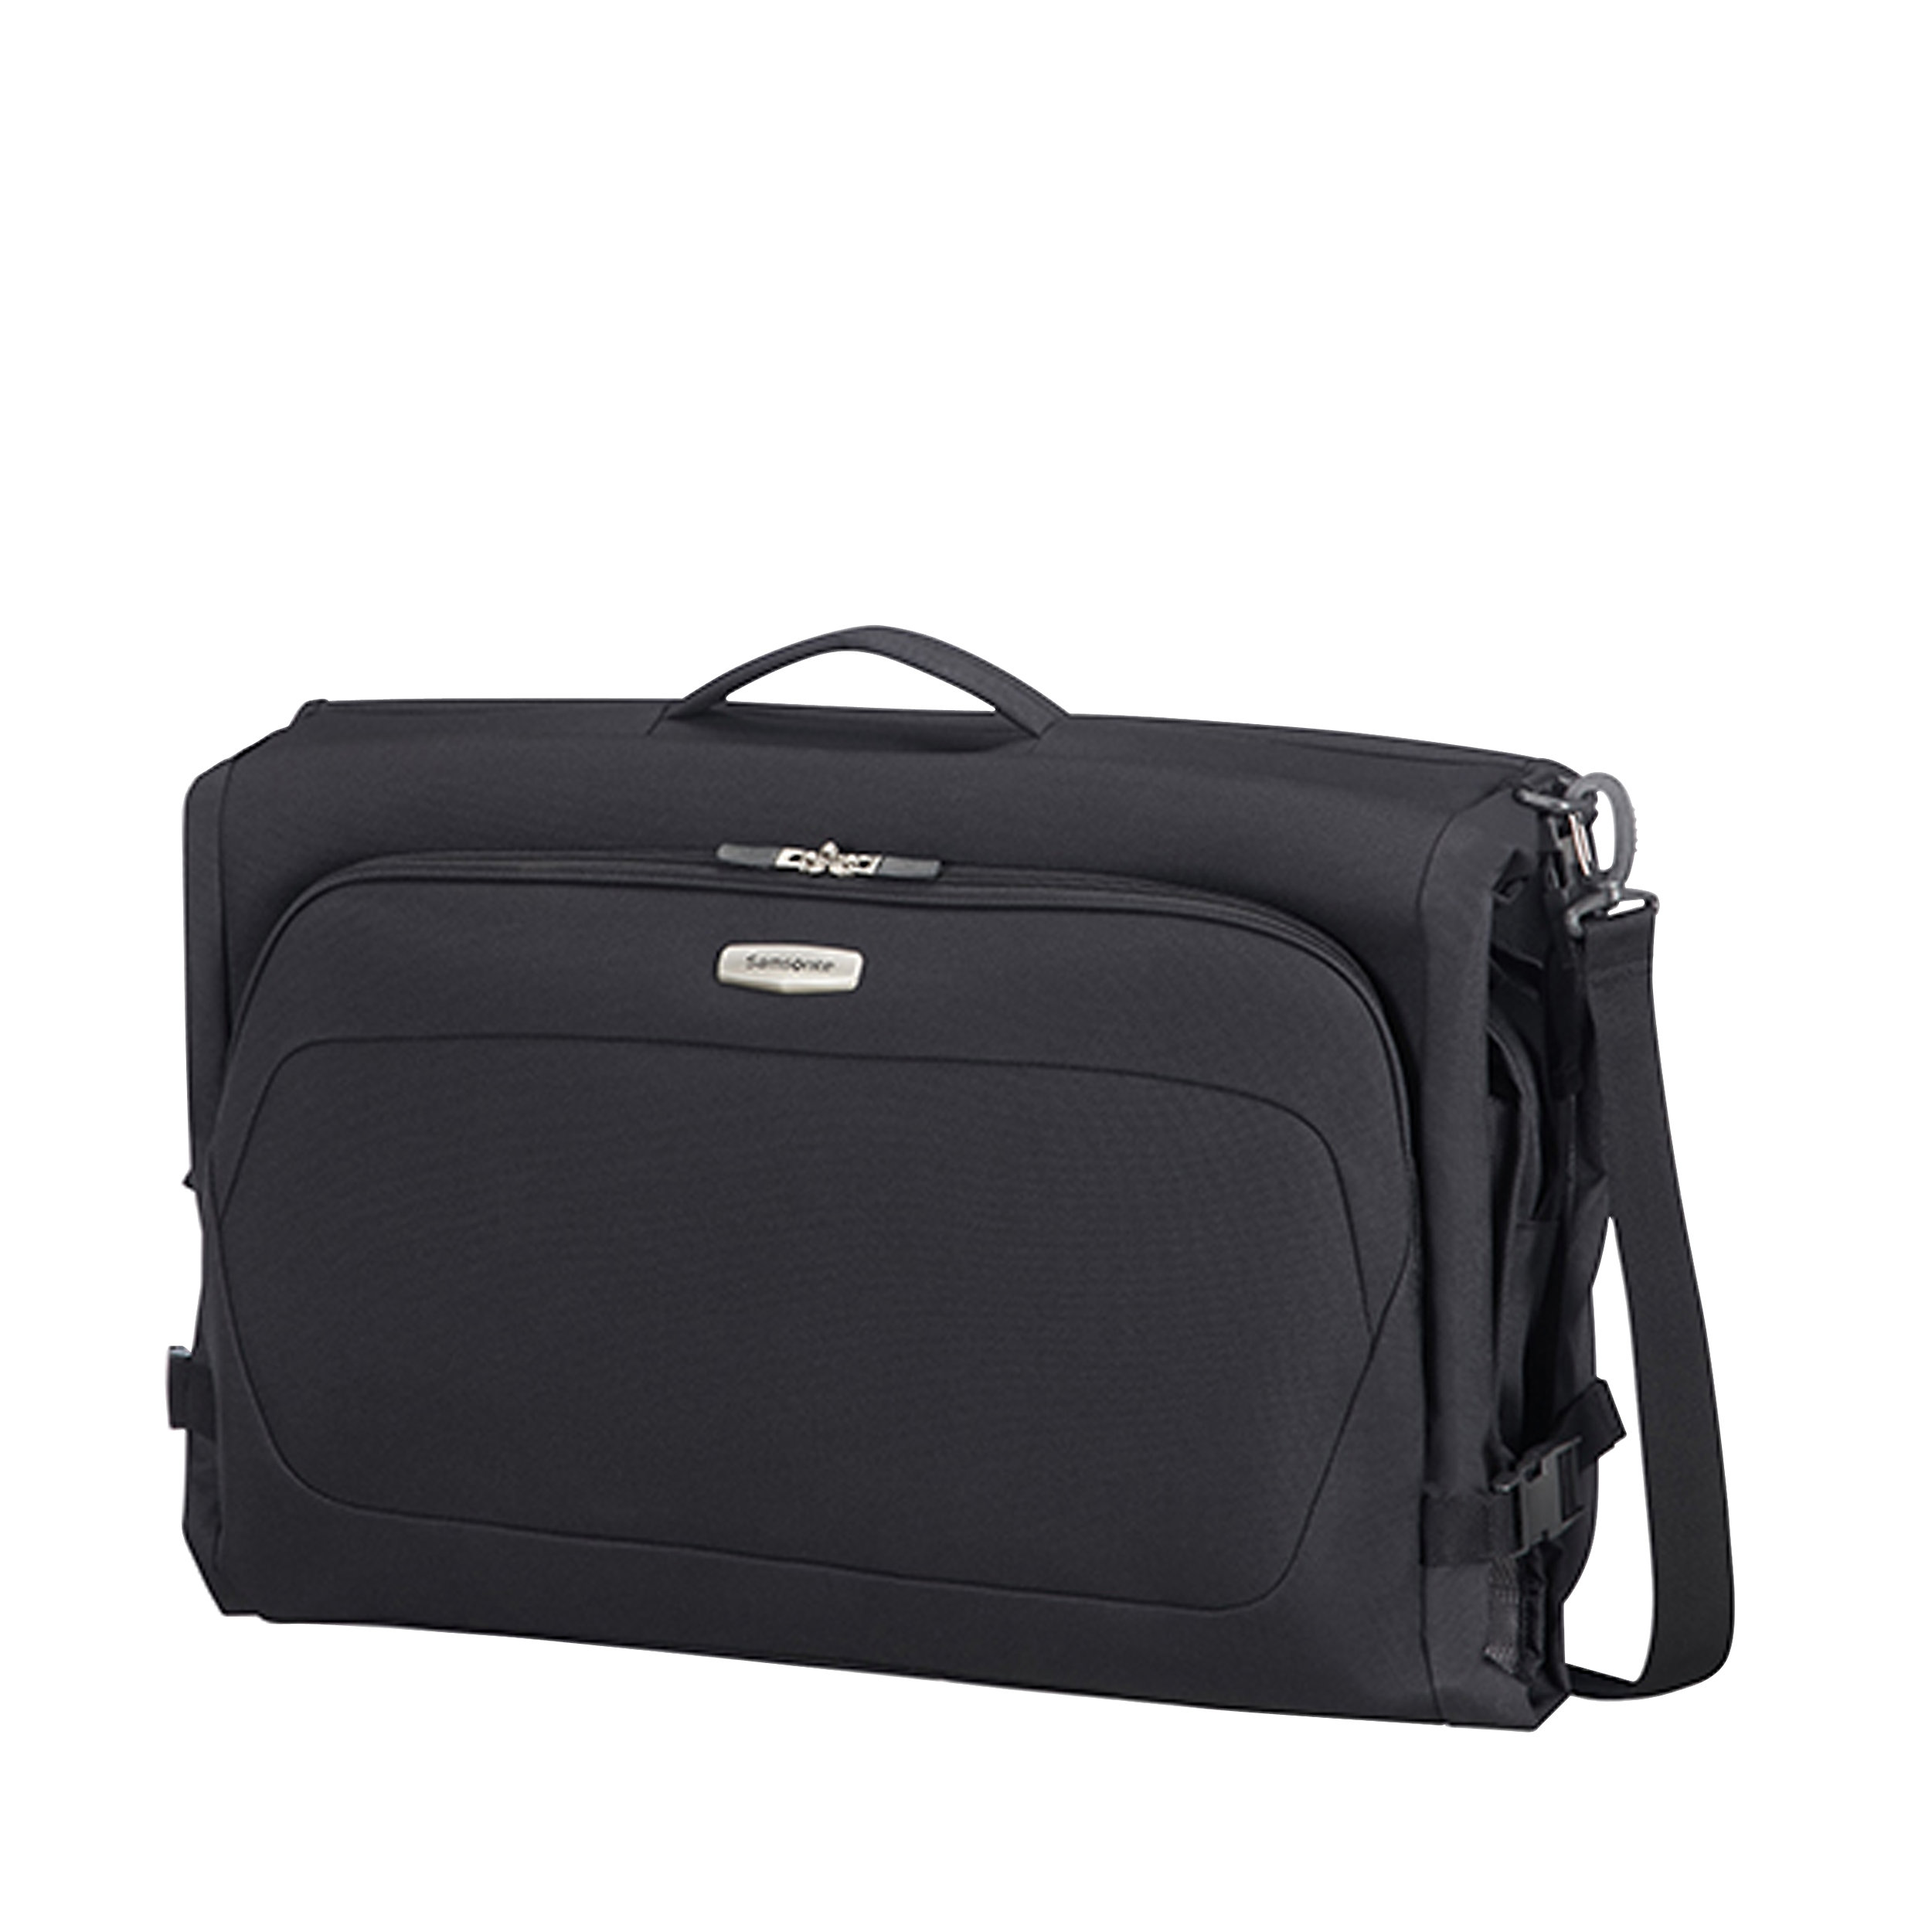 Garment Bag Tri-Fold Spark SNG 62 Liter